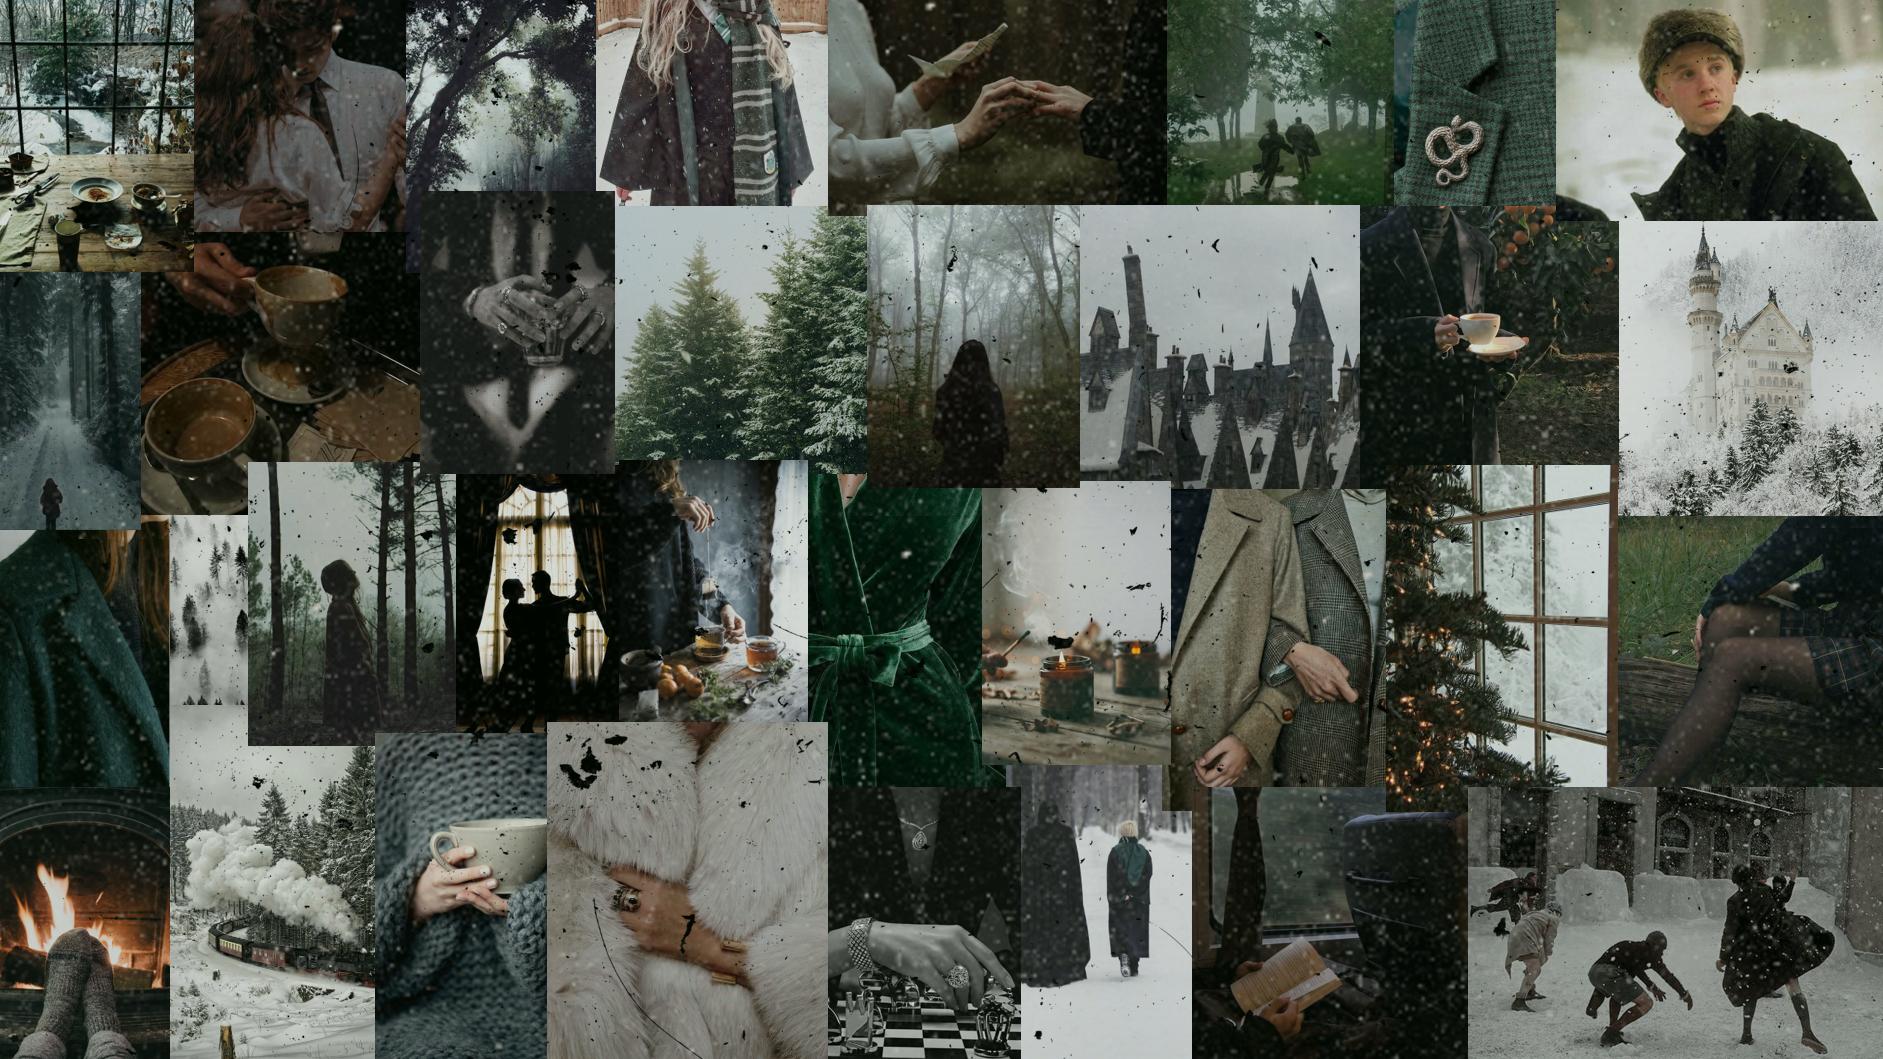 Slytherin Winter Desktop Wallpaper Desktop Wallpaper Harry Potter Slytherin Wallpaper Wallpaper